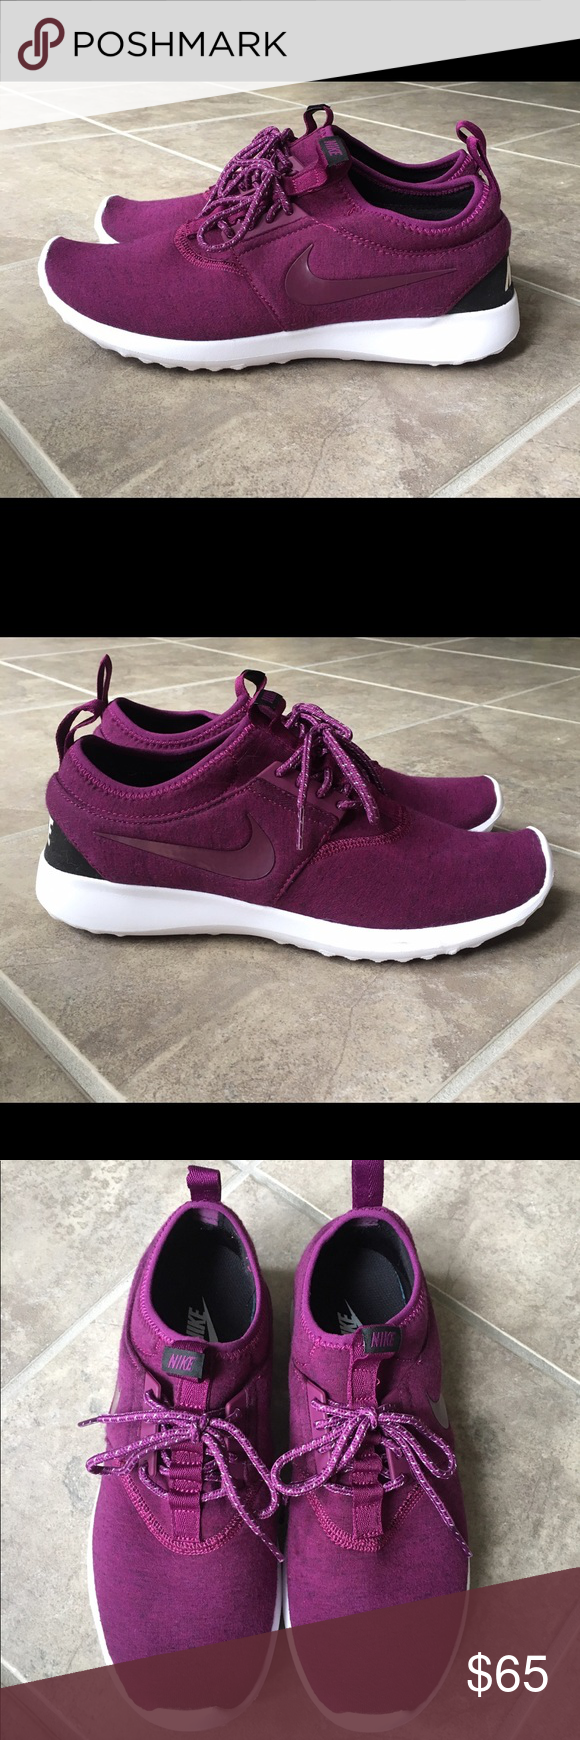 nuove scarpe nike juvenate mai portato nike juvenate mulberry / nero